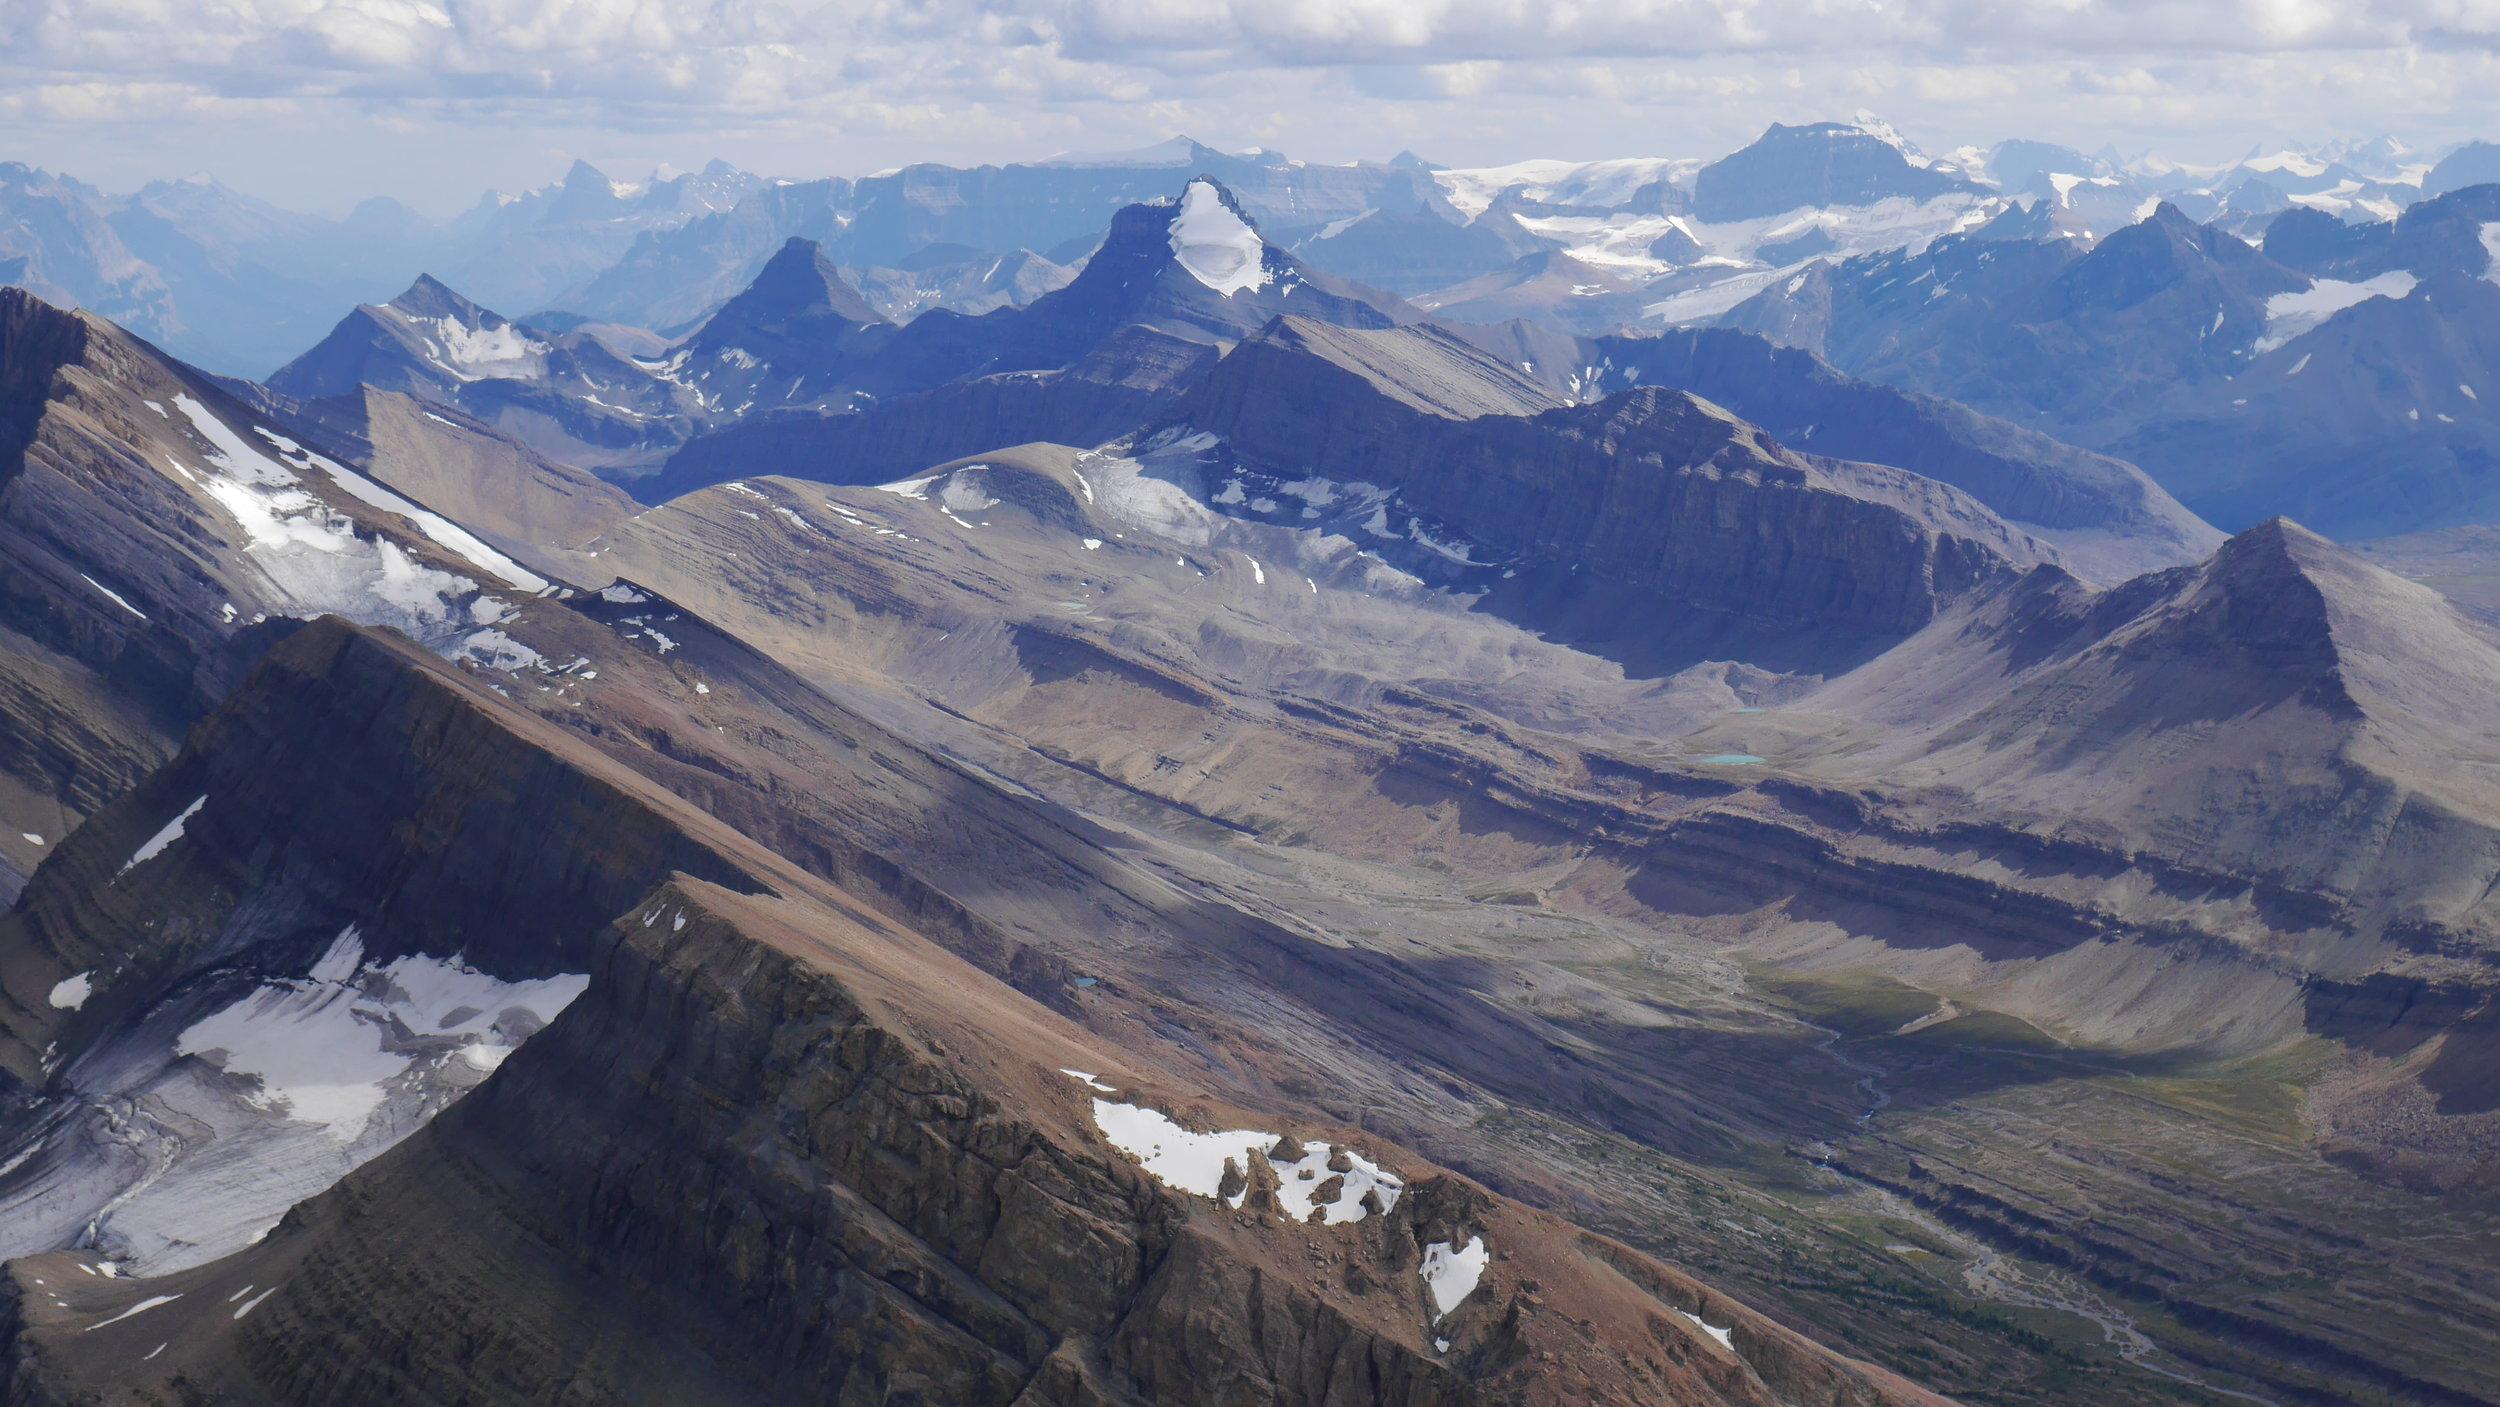 Nigel Peak from Sunwapta Peak 3,315m